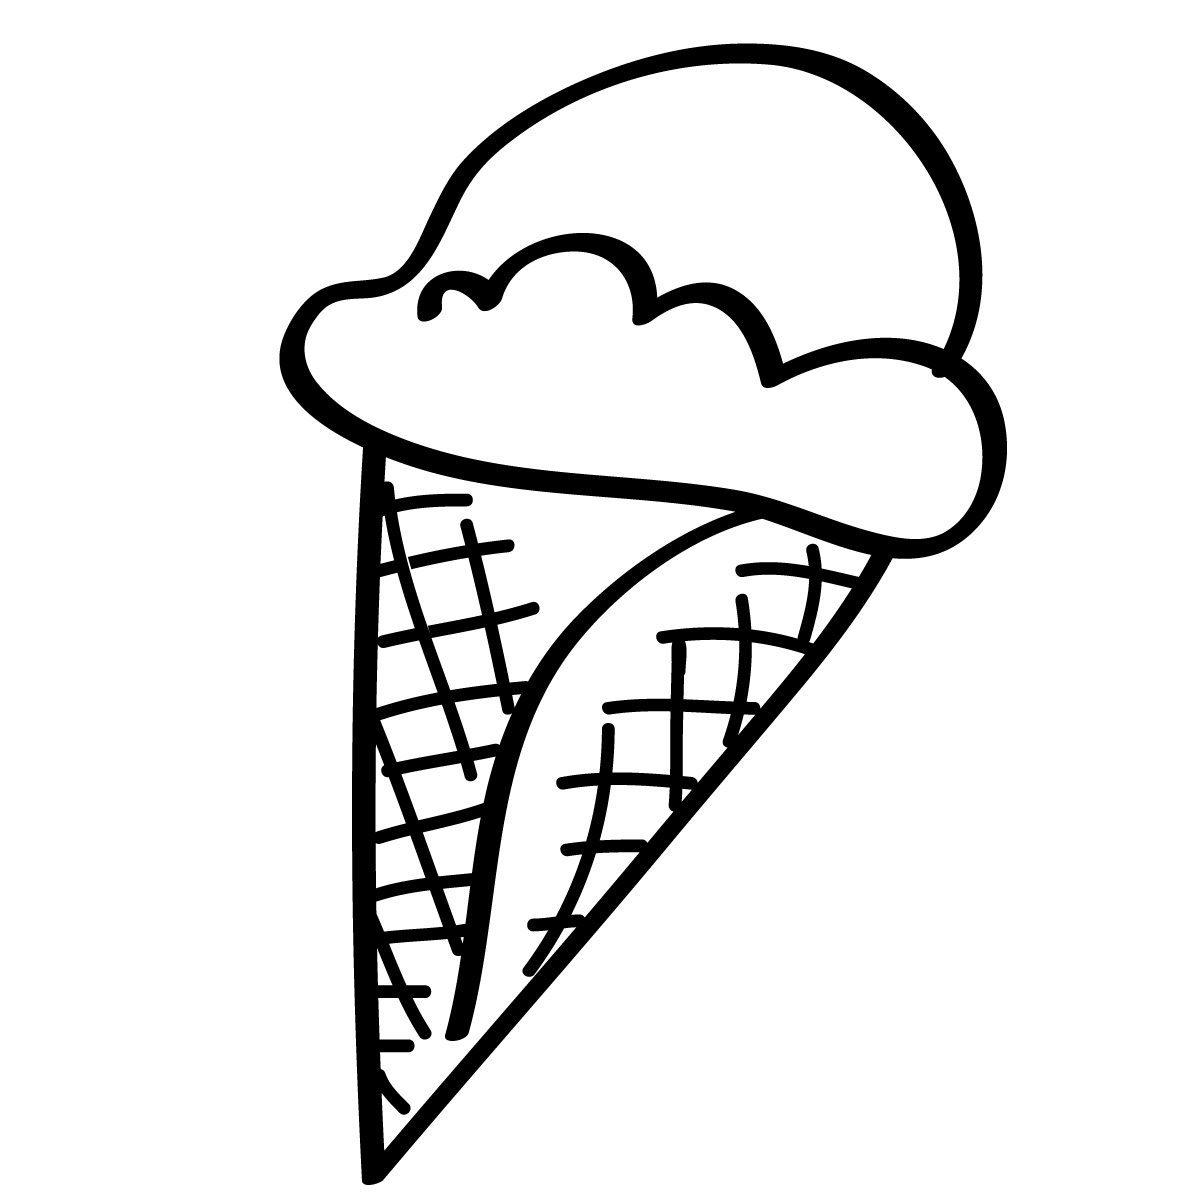 1200x1200 Blank Ice Cream Cone Outline Clip Art Clipart Image